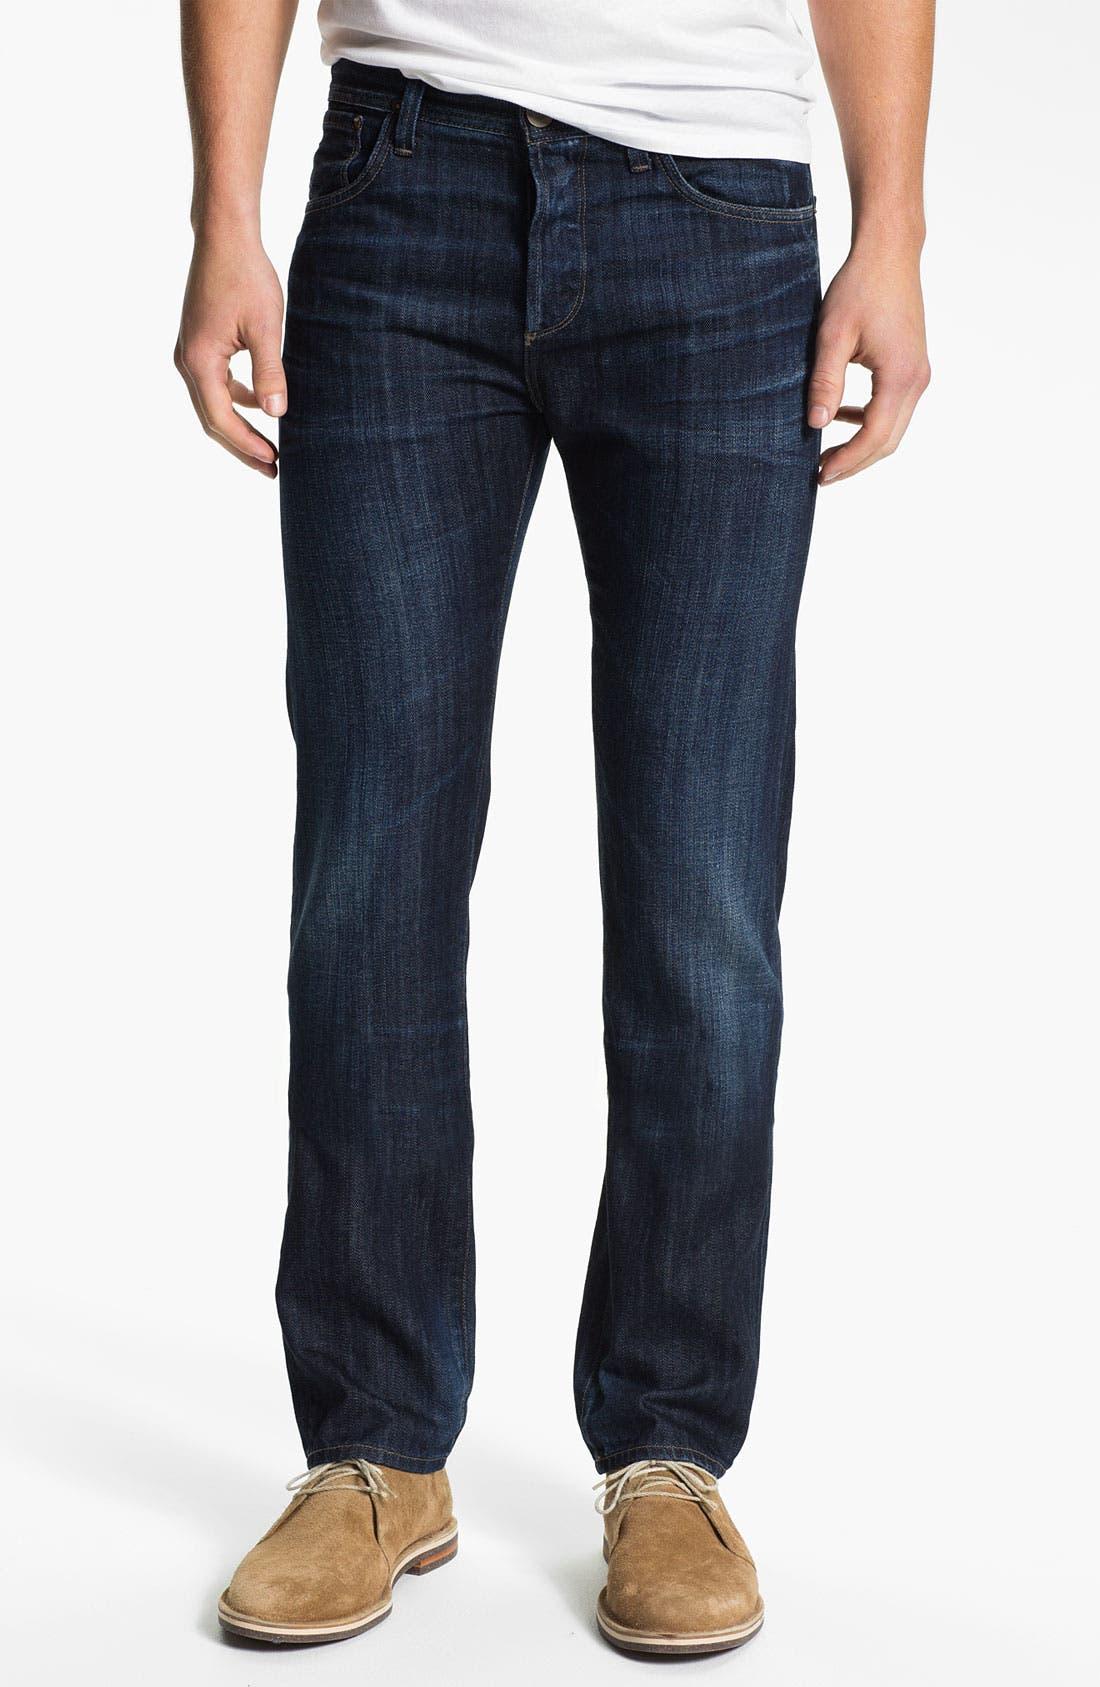 Main Image - Citizens of Humanity 'Core' Slim Straight Leg Jeans (Gleen)